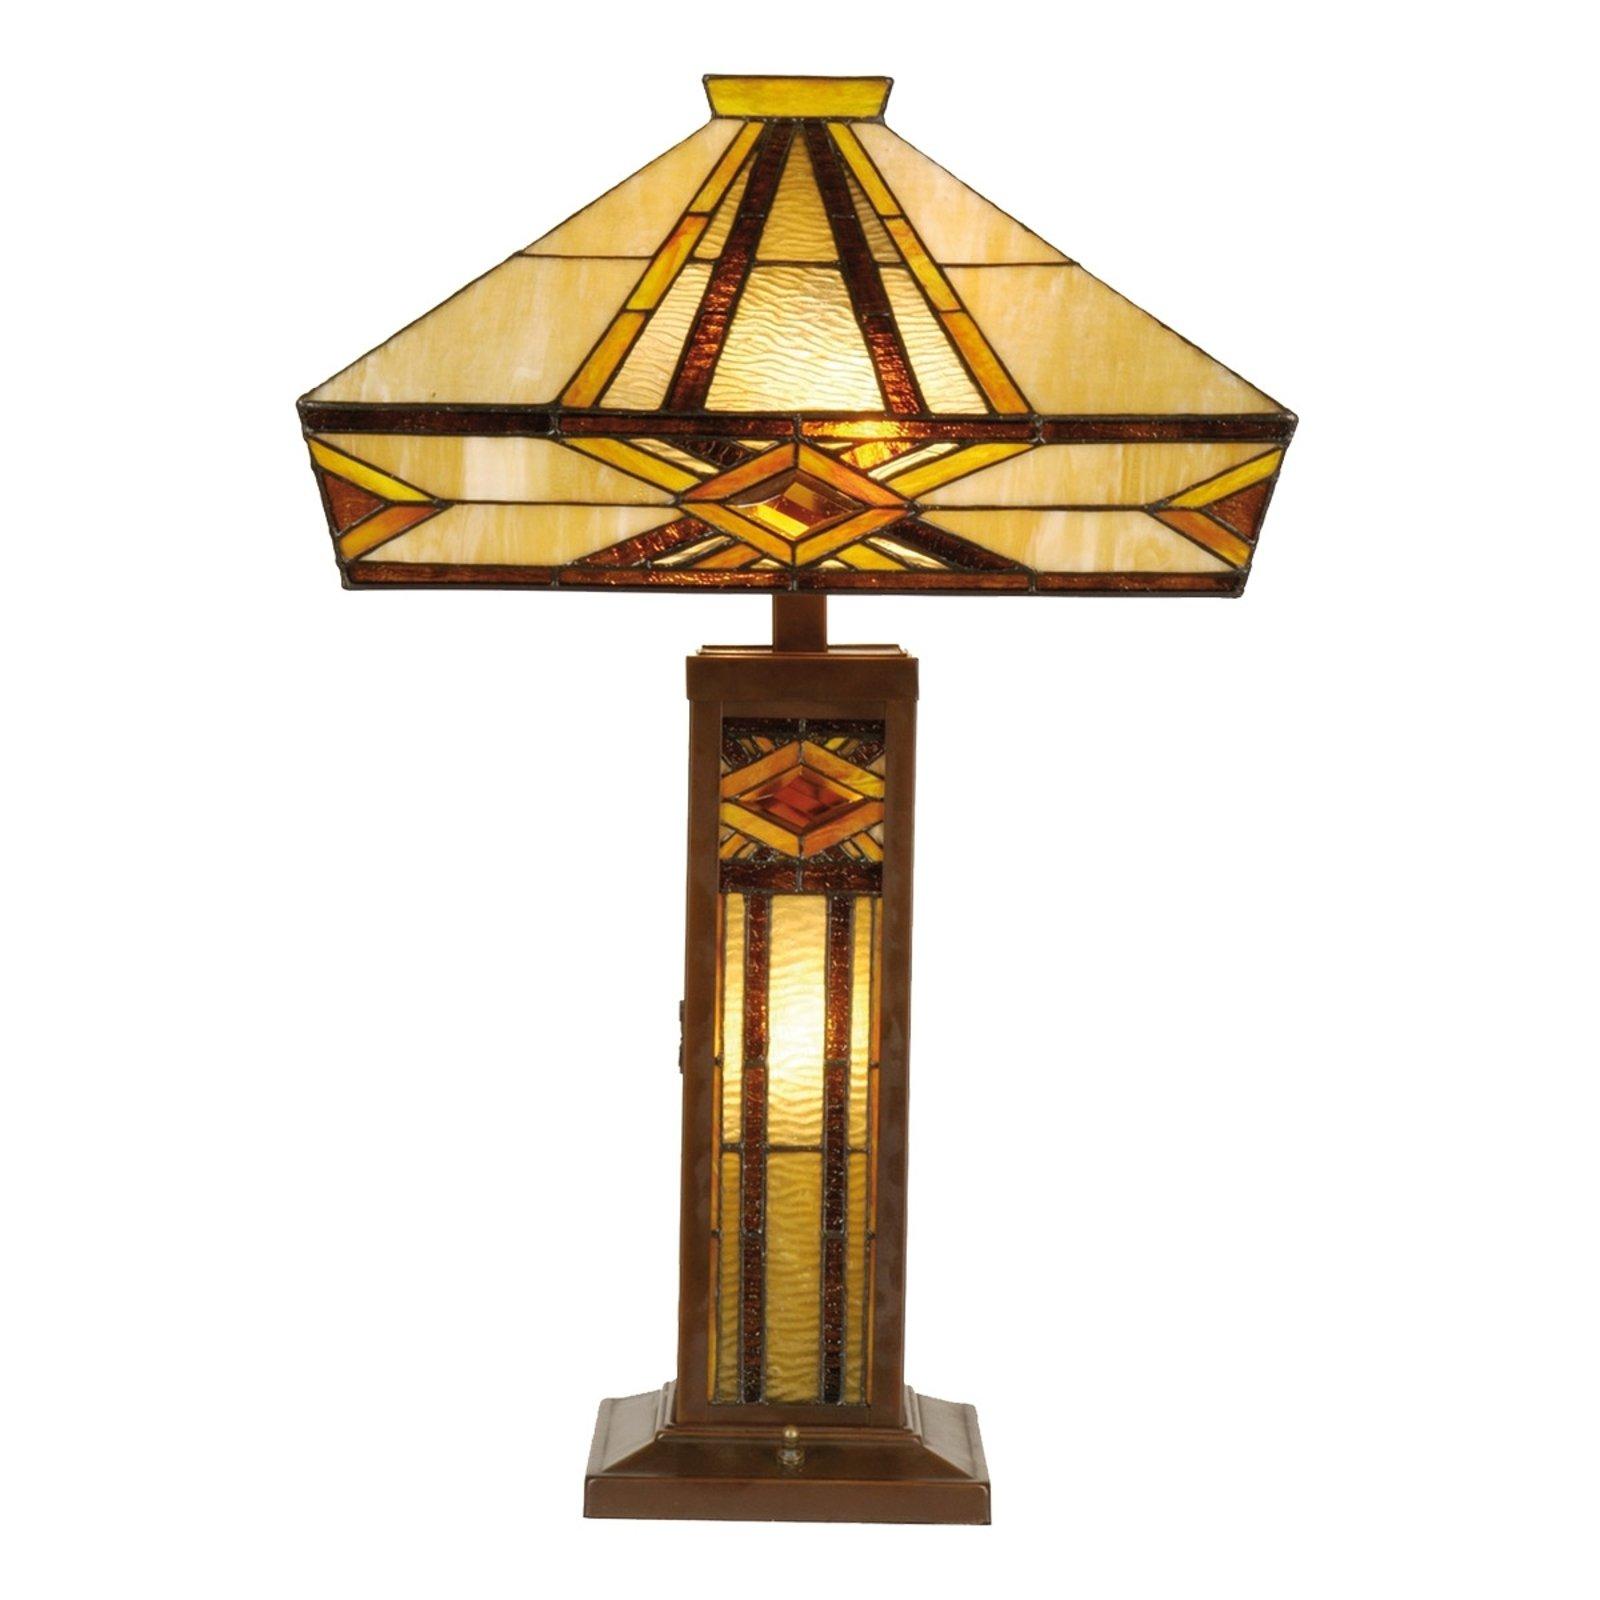 Bordlampe Glenys med kraftig lys, Tiffany-stil